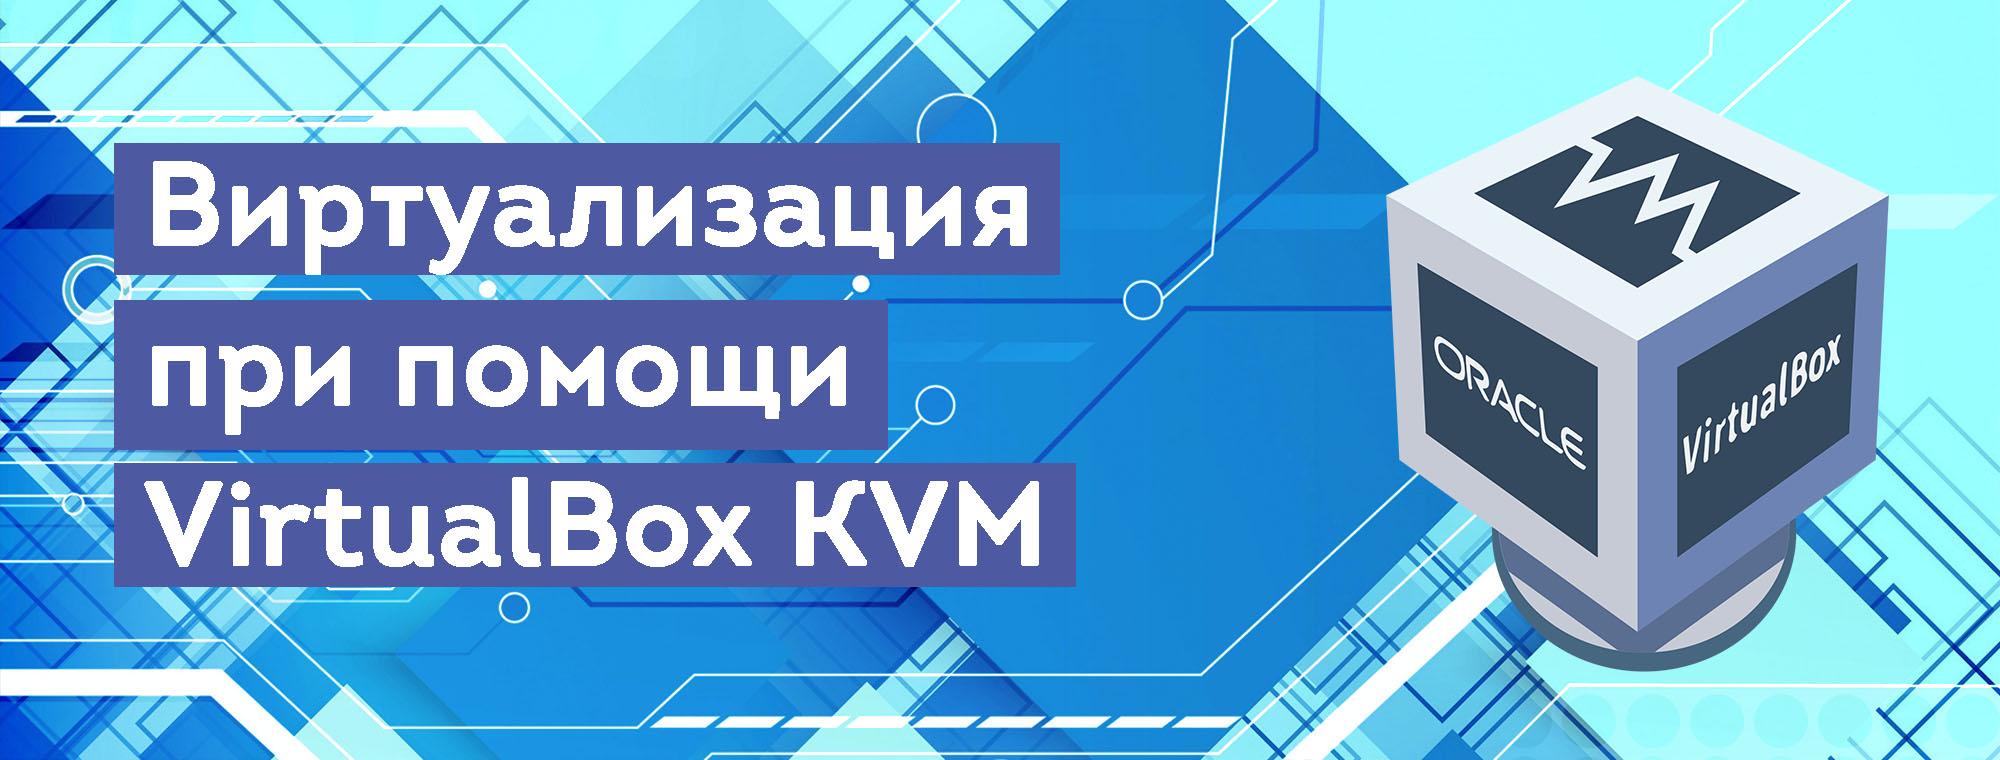 virtualizatsiya-pri-pomoschi-virtualbox-kvm